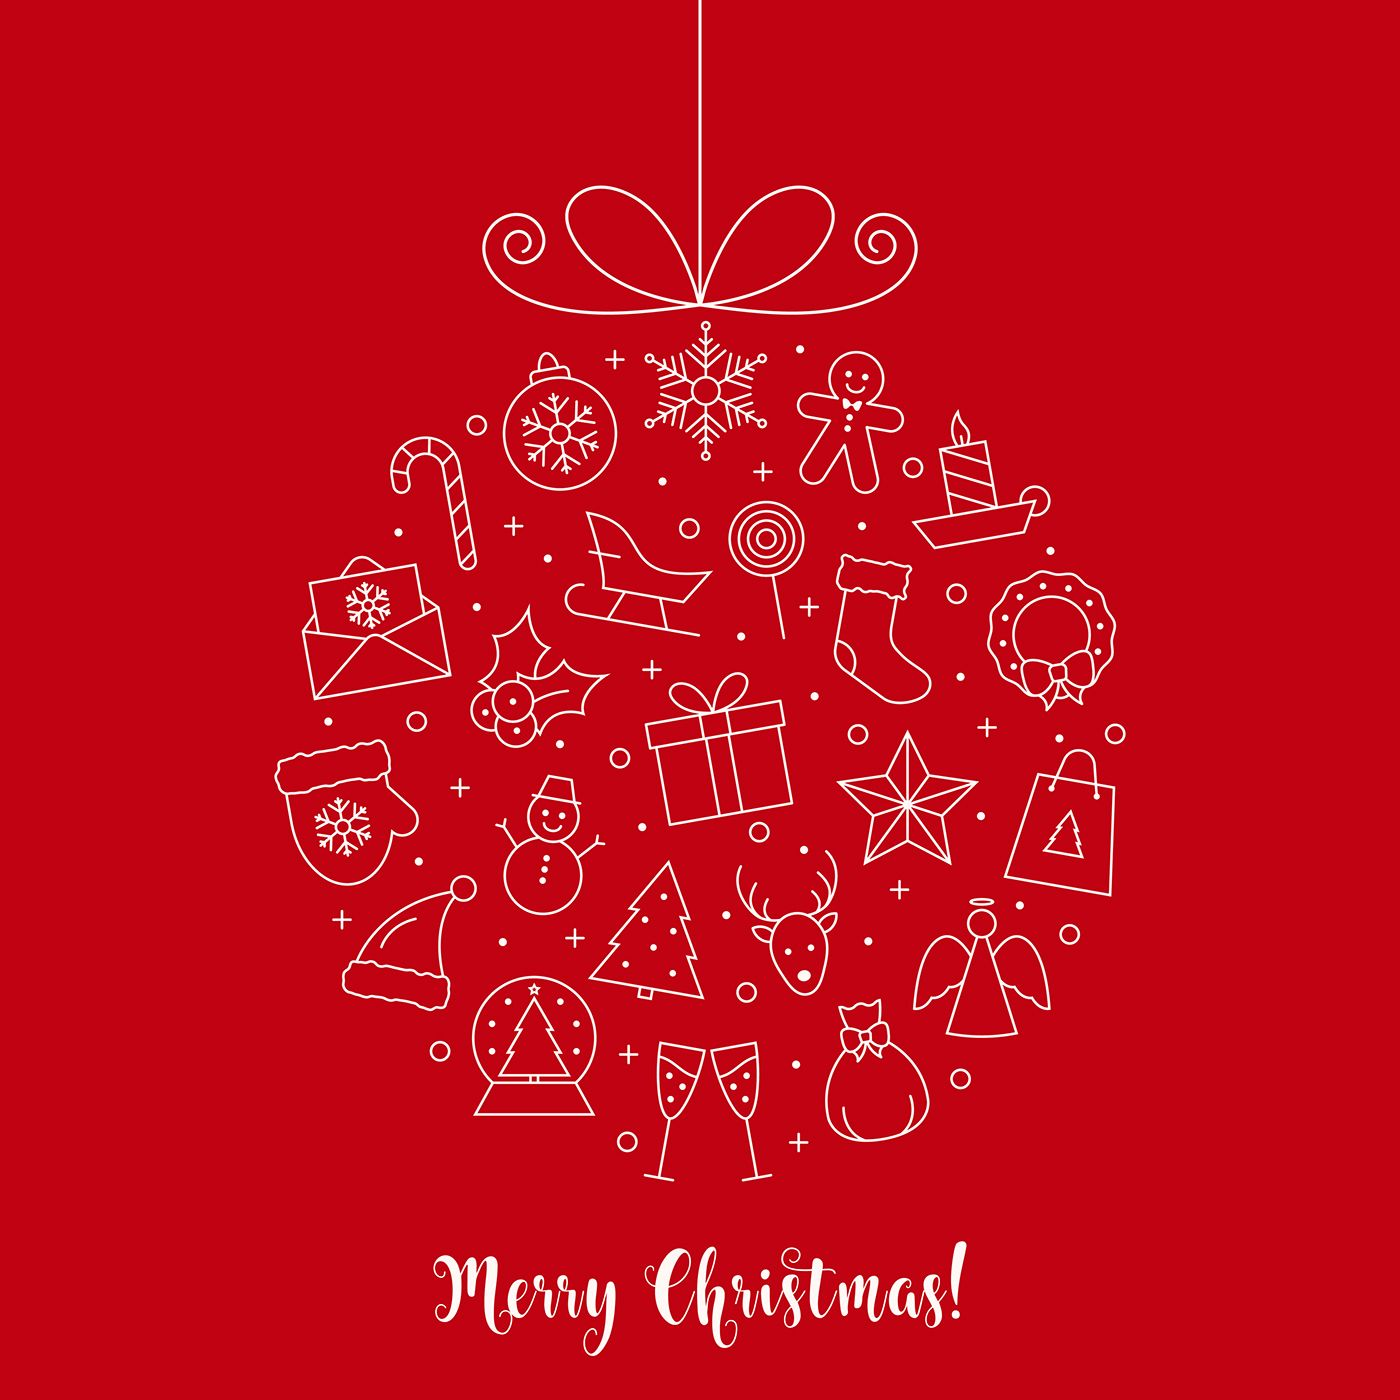 Christmas Icons Set on Behance   Christmas flyer, Merry christmas and happy new year, Christmas ...